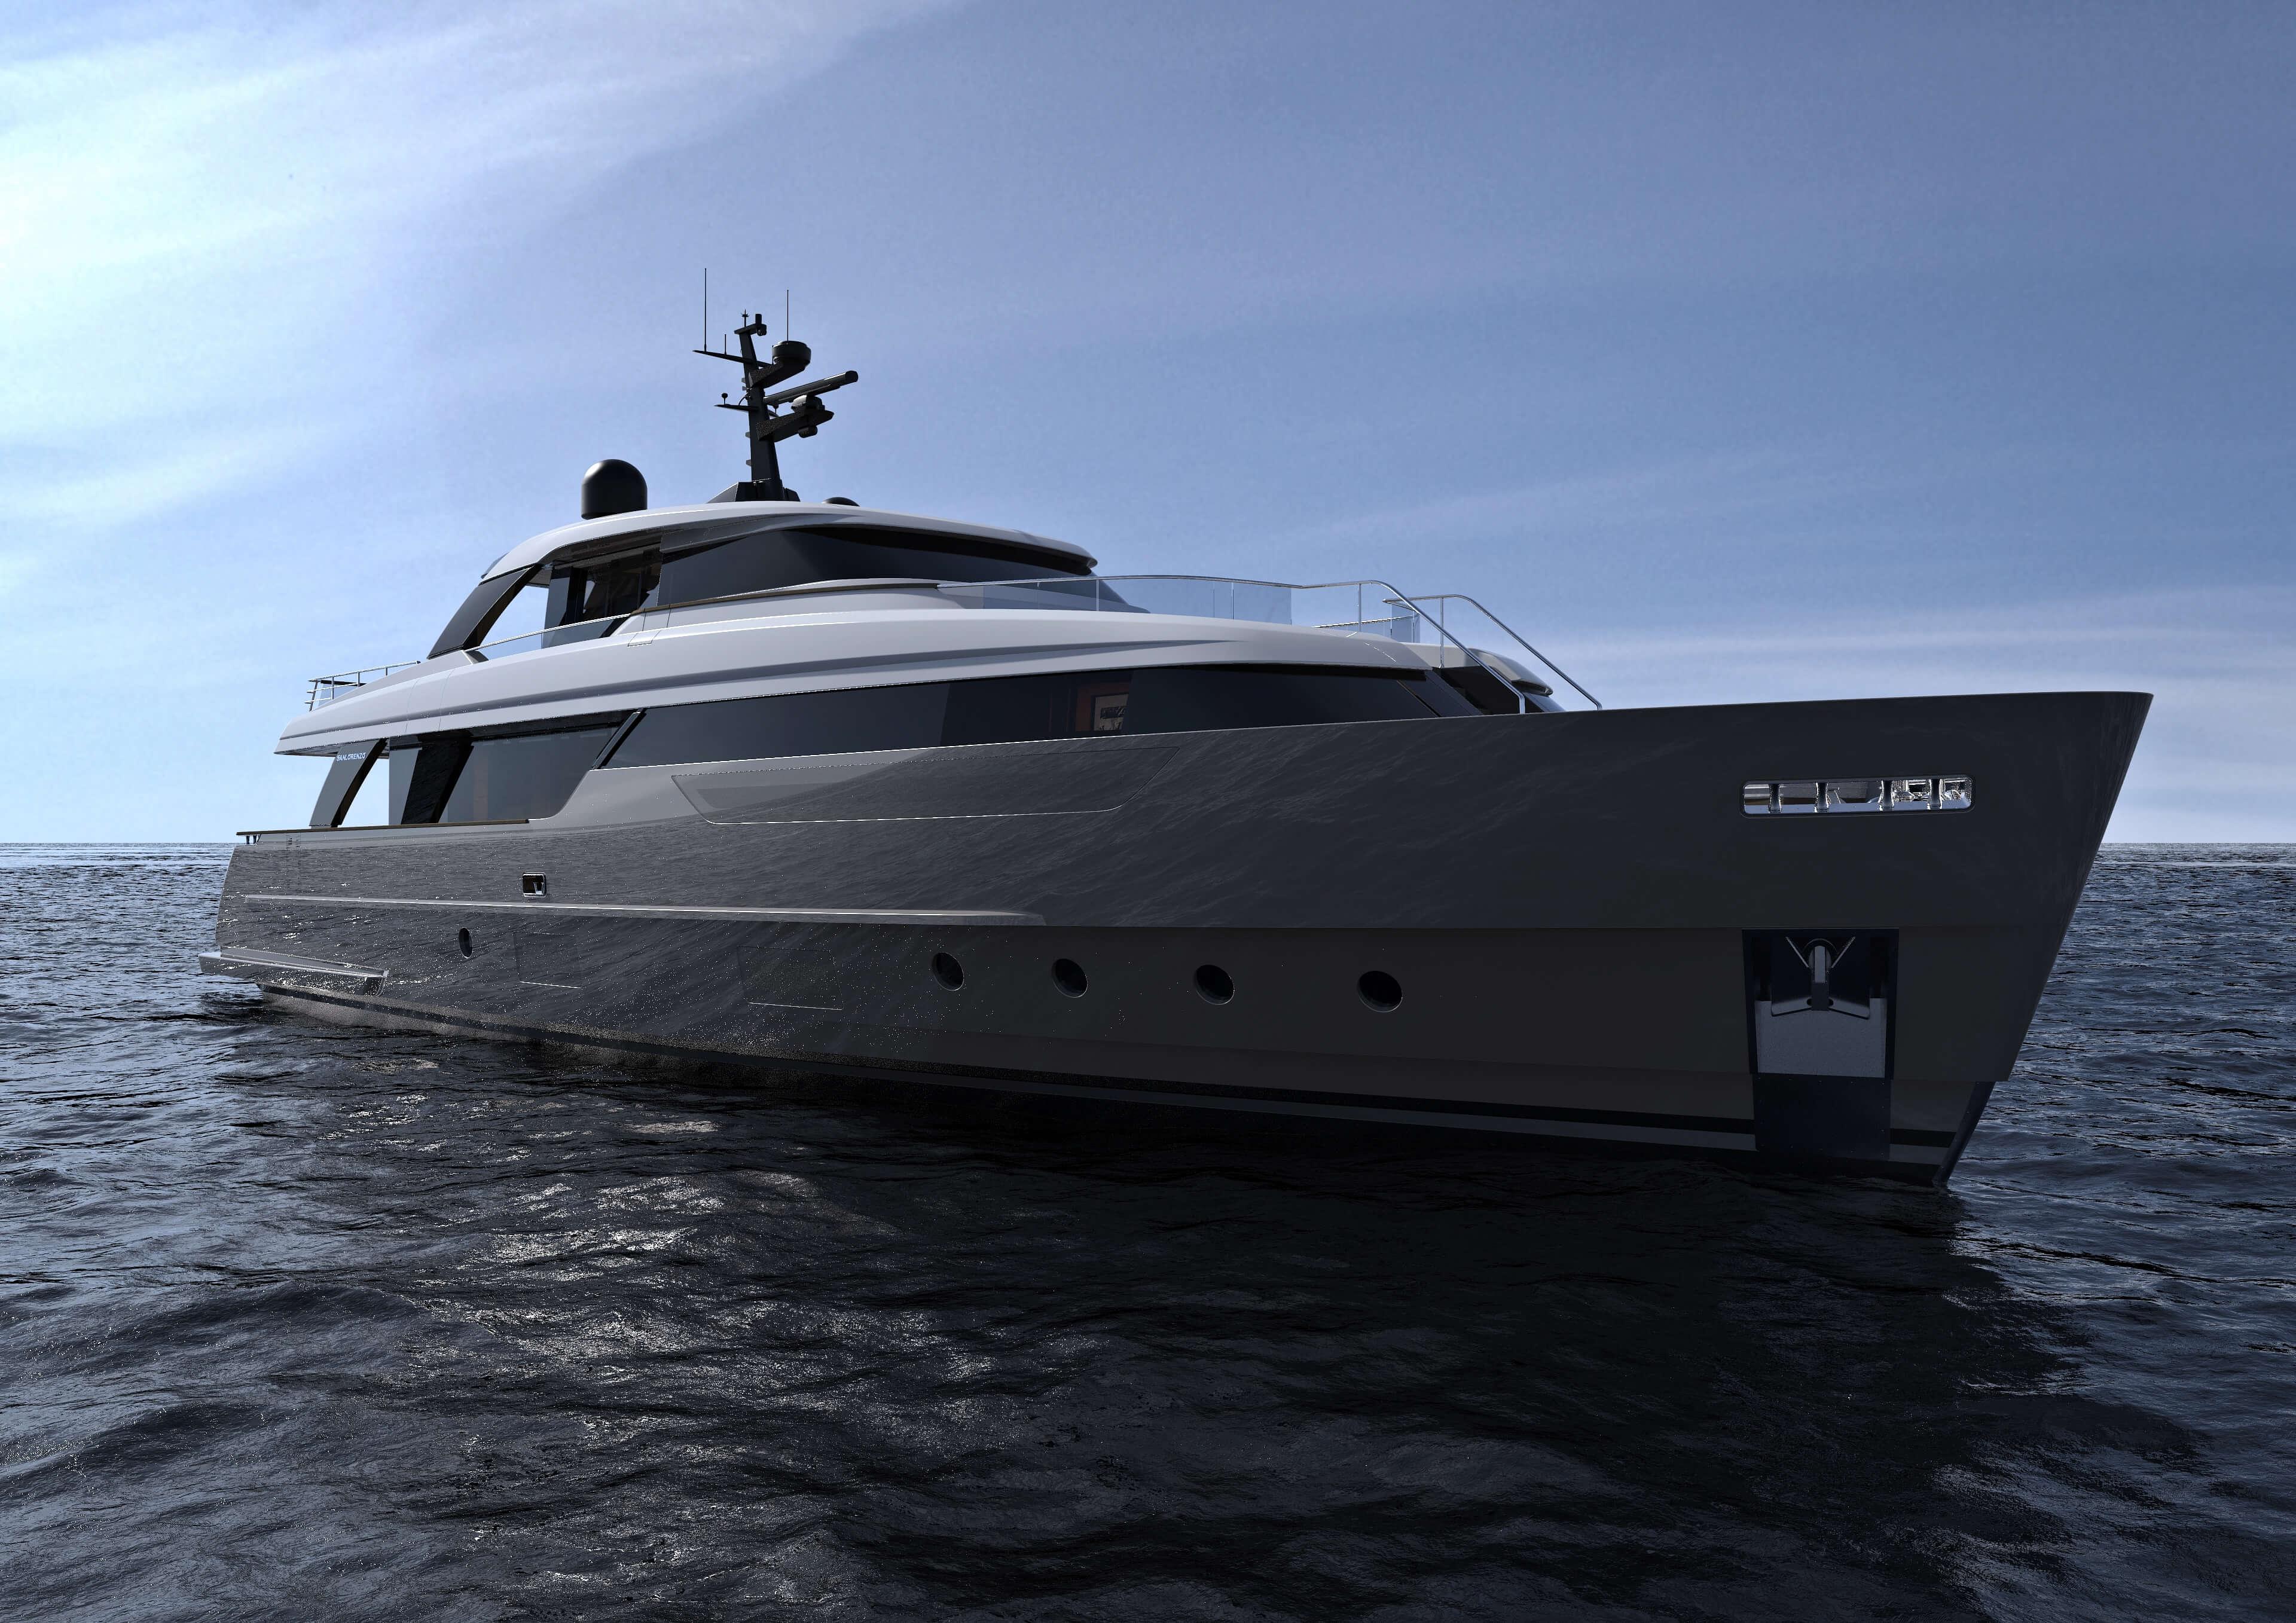 Sanlorenzo SD96 - Lengers Yachts (1)Sanlorenzo SD96 - Lengers Yachts (1)